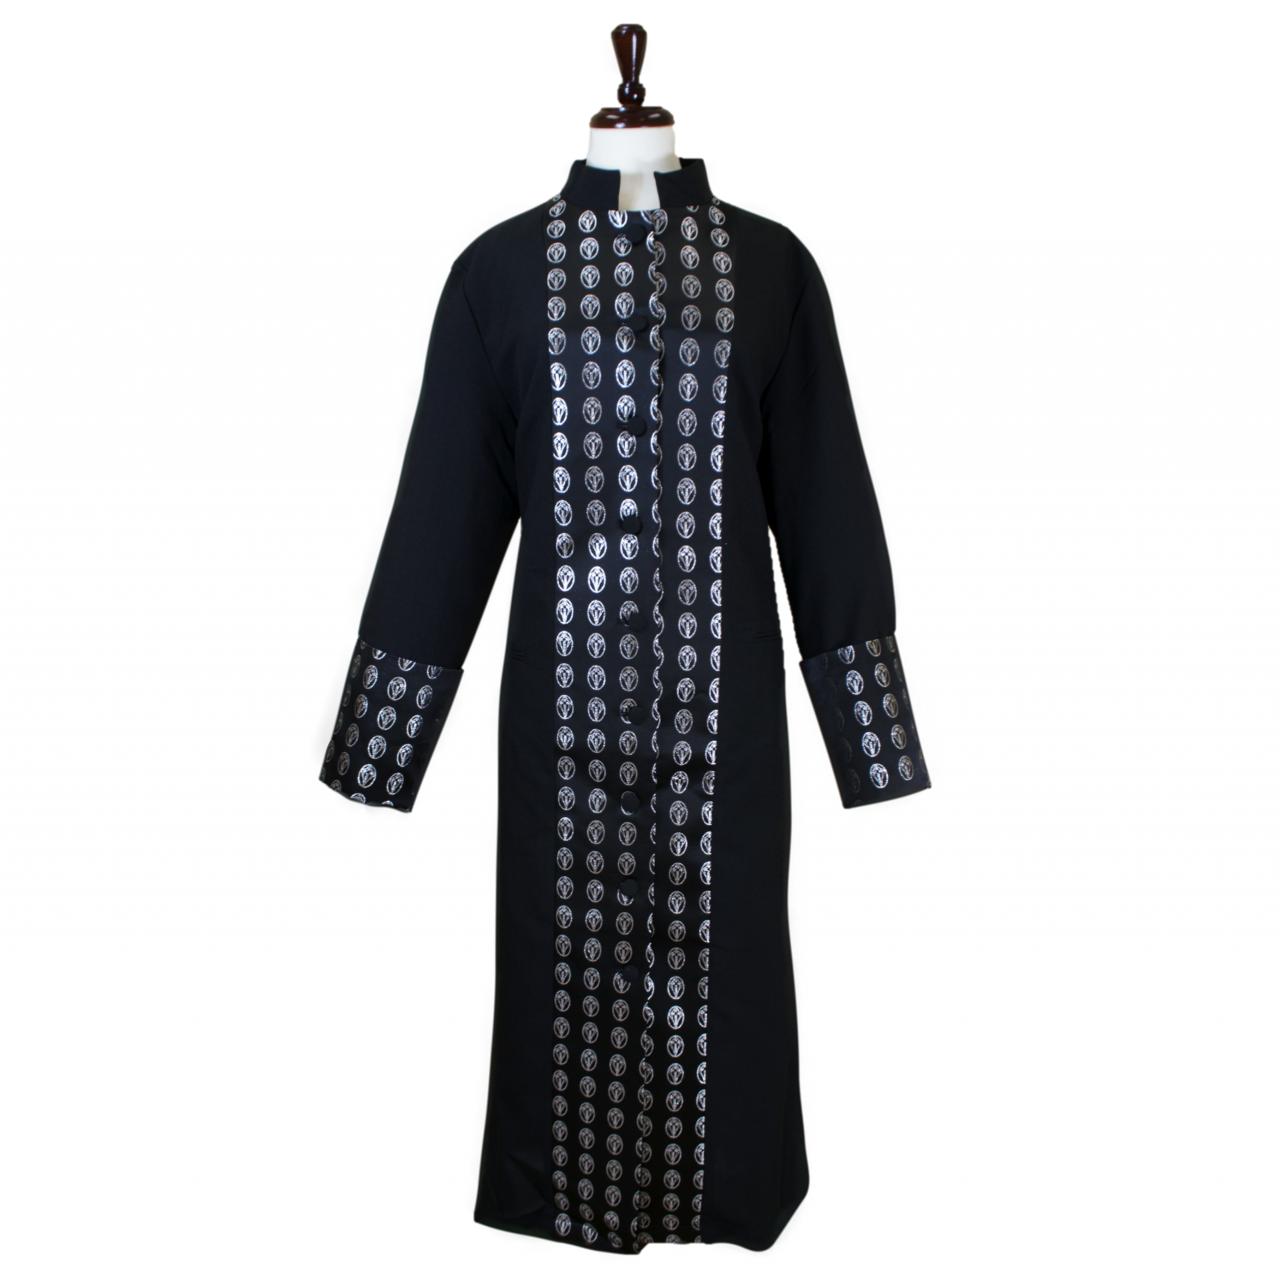 clergy robes - Google Search | Fashion that'll preach ...